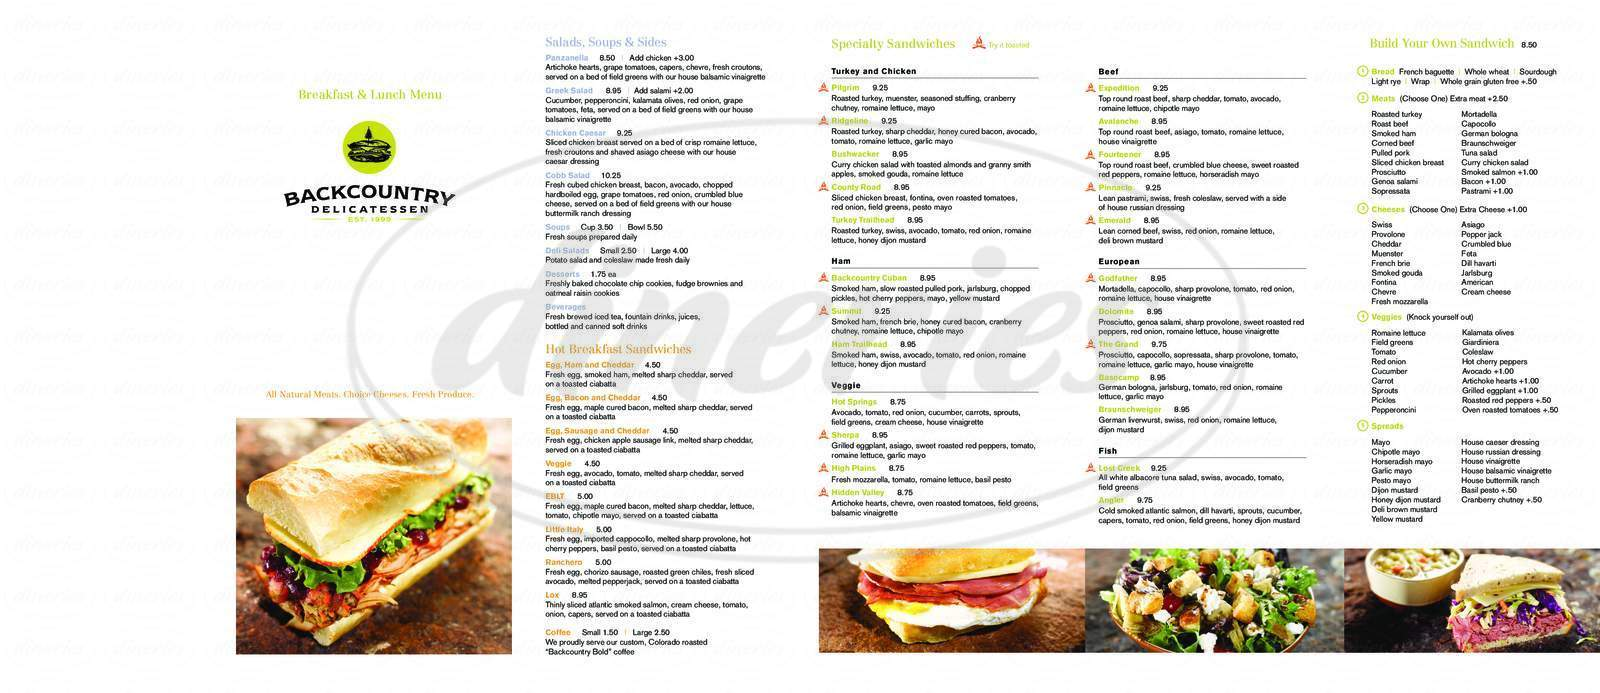 menu for Backcountry Delicatessen